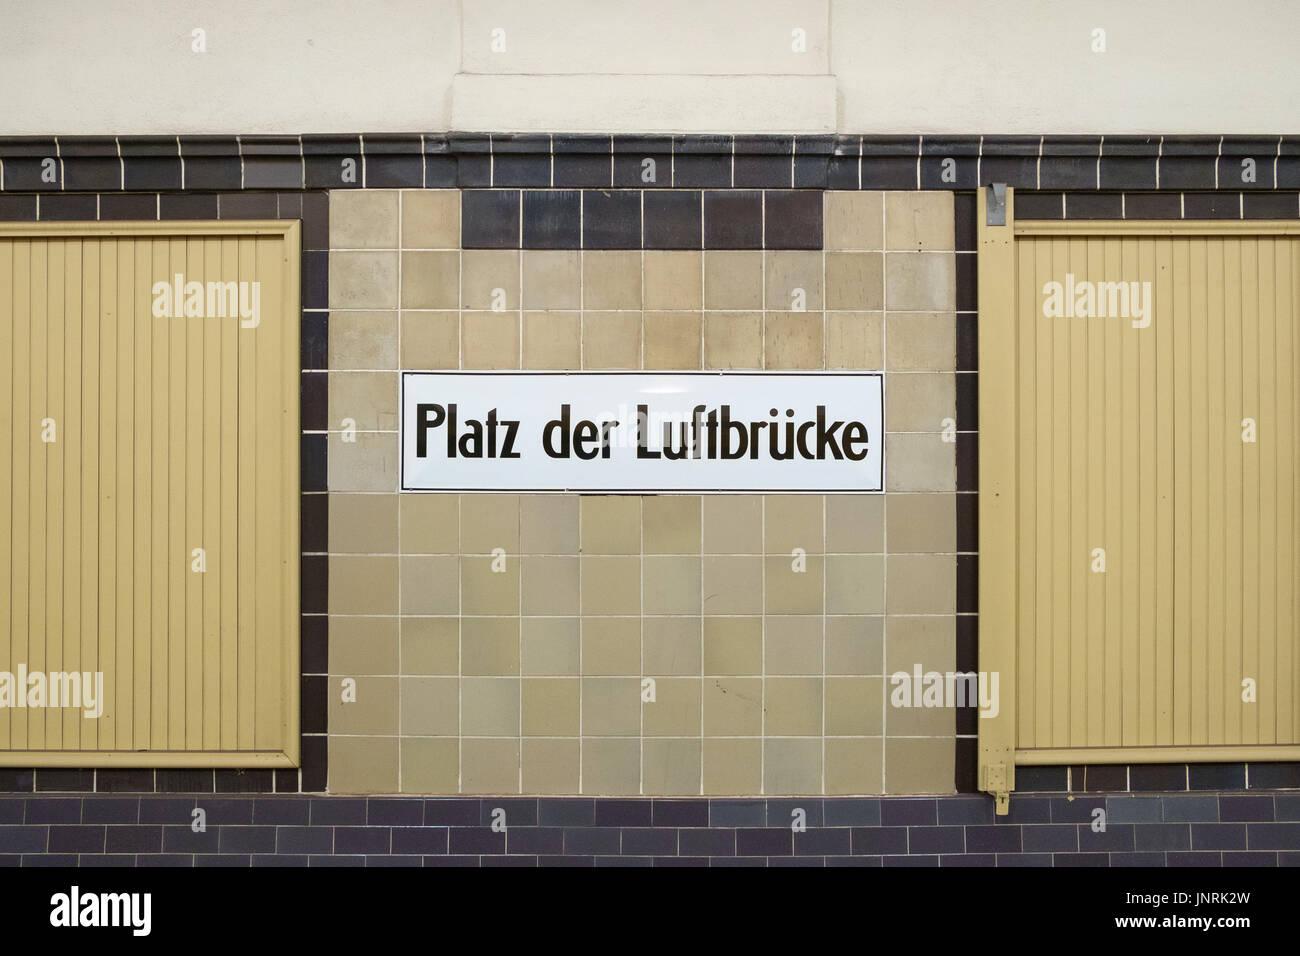 Station sign at subway station Platz der Luftbrucke, Berlin, Germany. - Stock Image